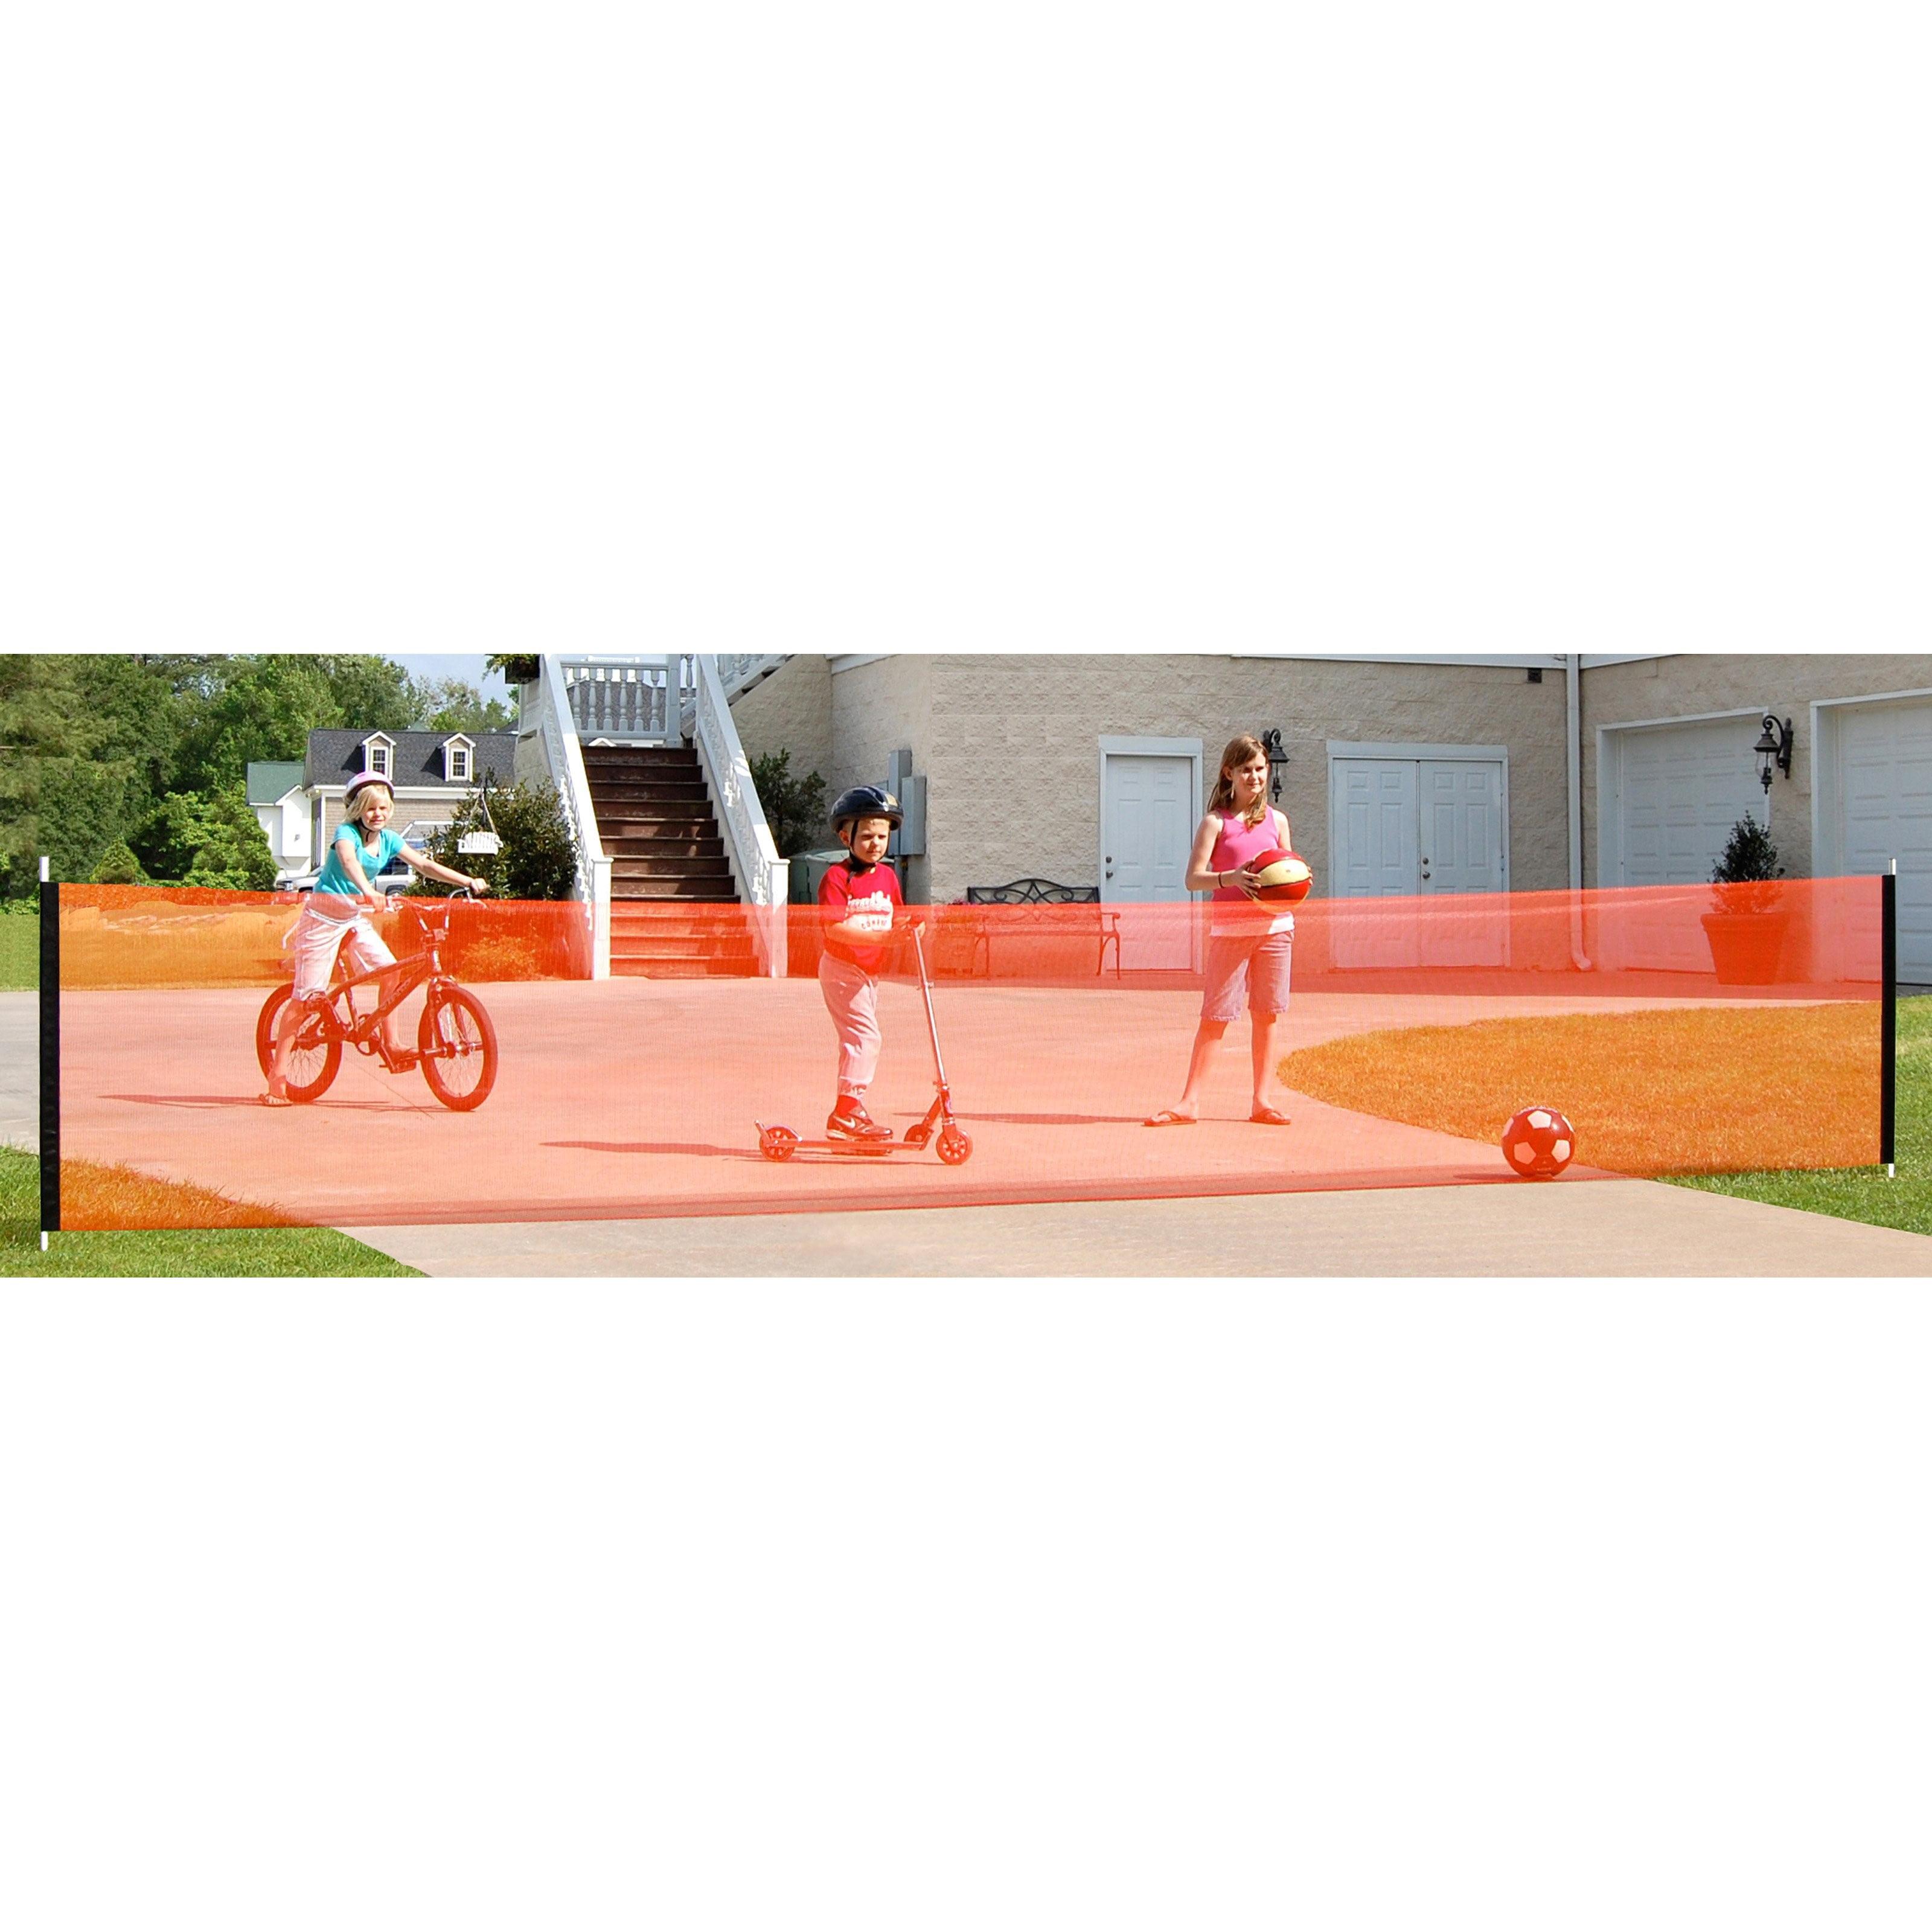 KidKusion Driveway Safety Net, 18 ft, Orange